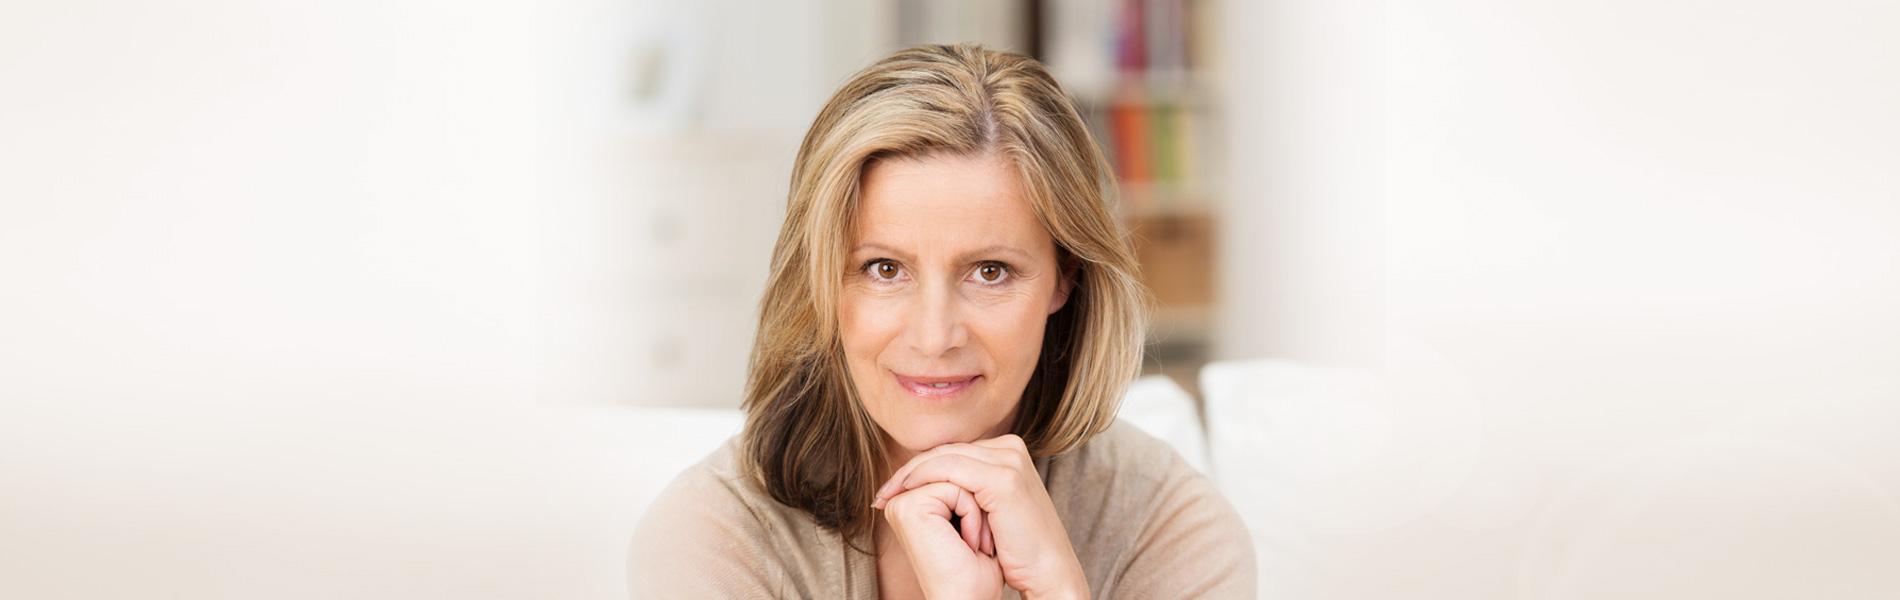 Rejuvenations Facial Aesthetic Clinic Anti Aging Treatments